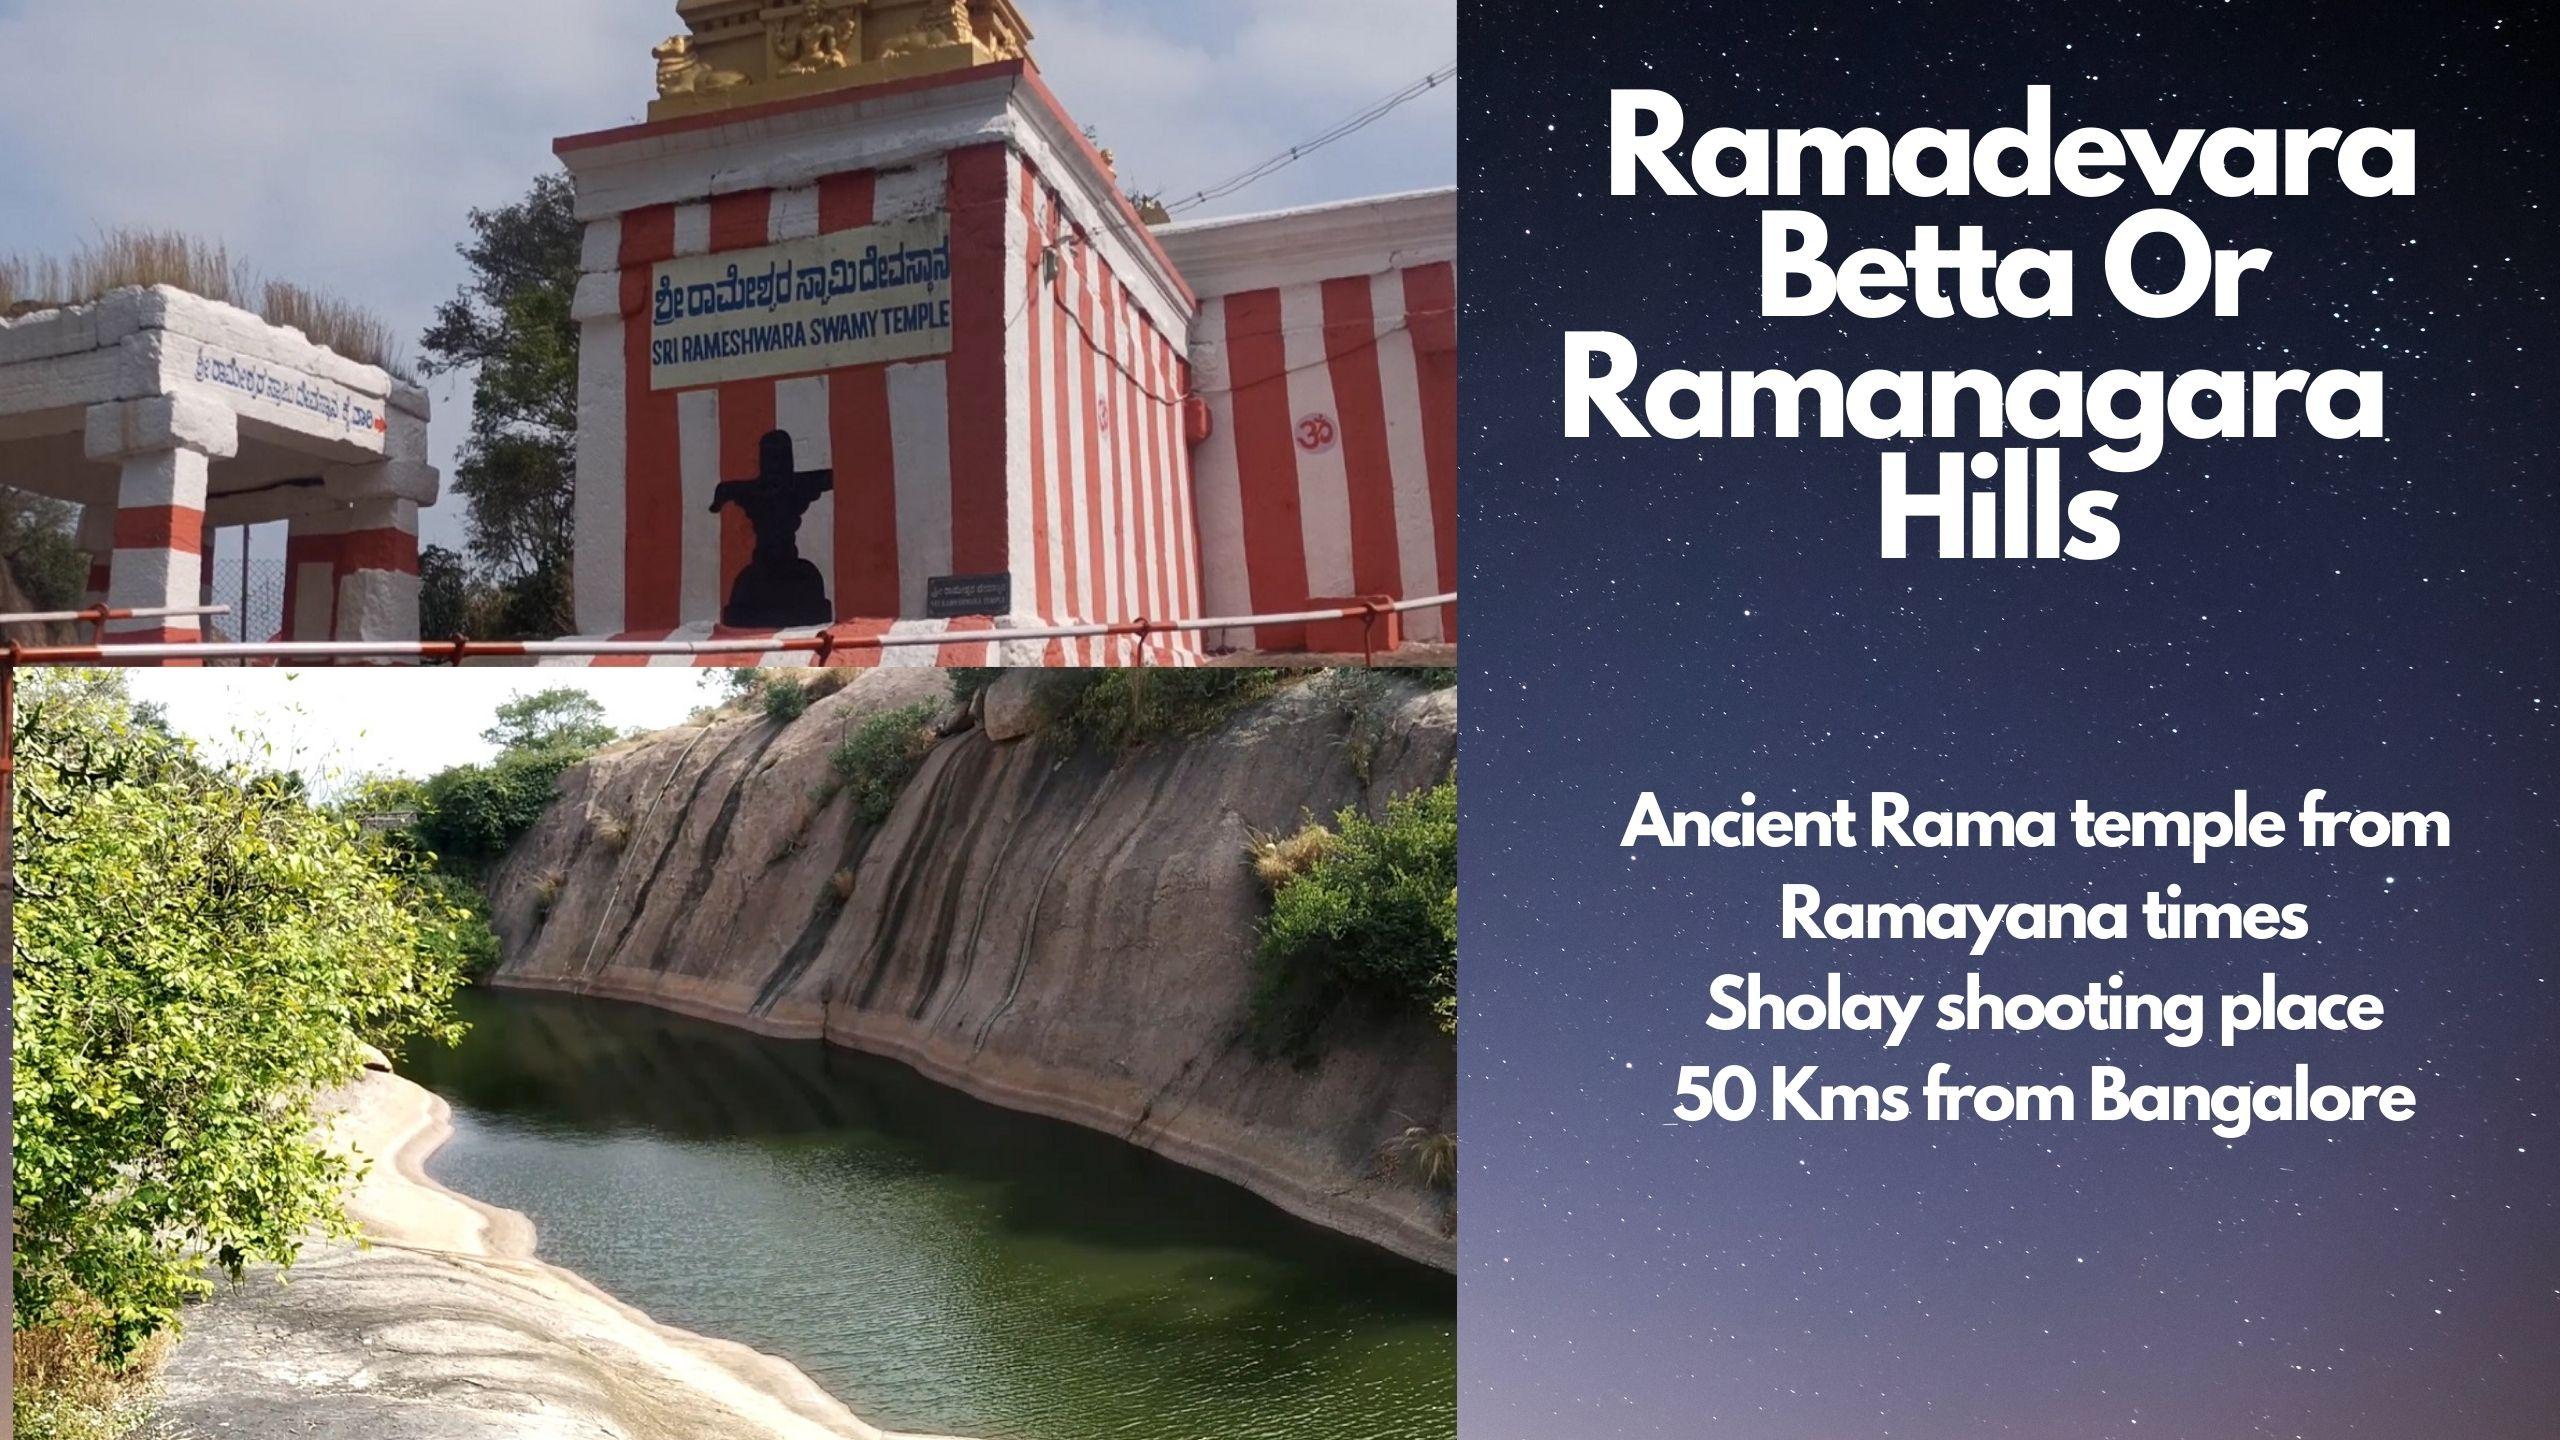 Ramadevara Betta Ramanagara Hills